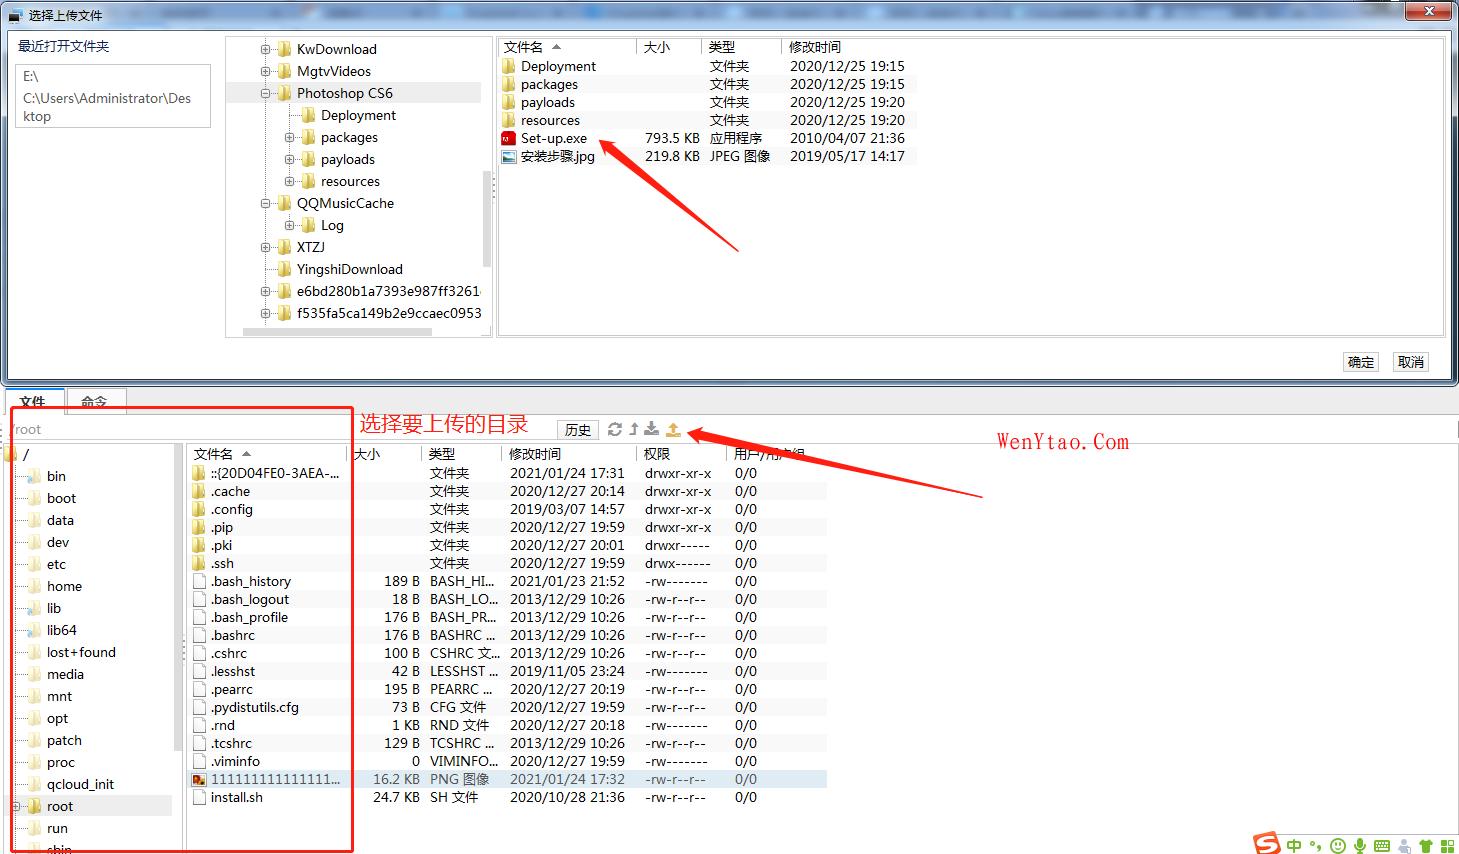 Linux系统服务器远程SSH管理工具使用教程(FinalShell篇),Linux系统服务器远程SSH管理工具使用教程(FinalShell篇) Linux系统服务器远程SSH ssh链接教程 linux服务器 宝塔 文曦 密码 Linux 功能 脚本 第4张,Linux系统服务器远程SSH,ssh链接教程,linux服务器,宝塔,文曦,密码,Linux,功能,脚本,第4张